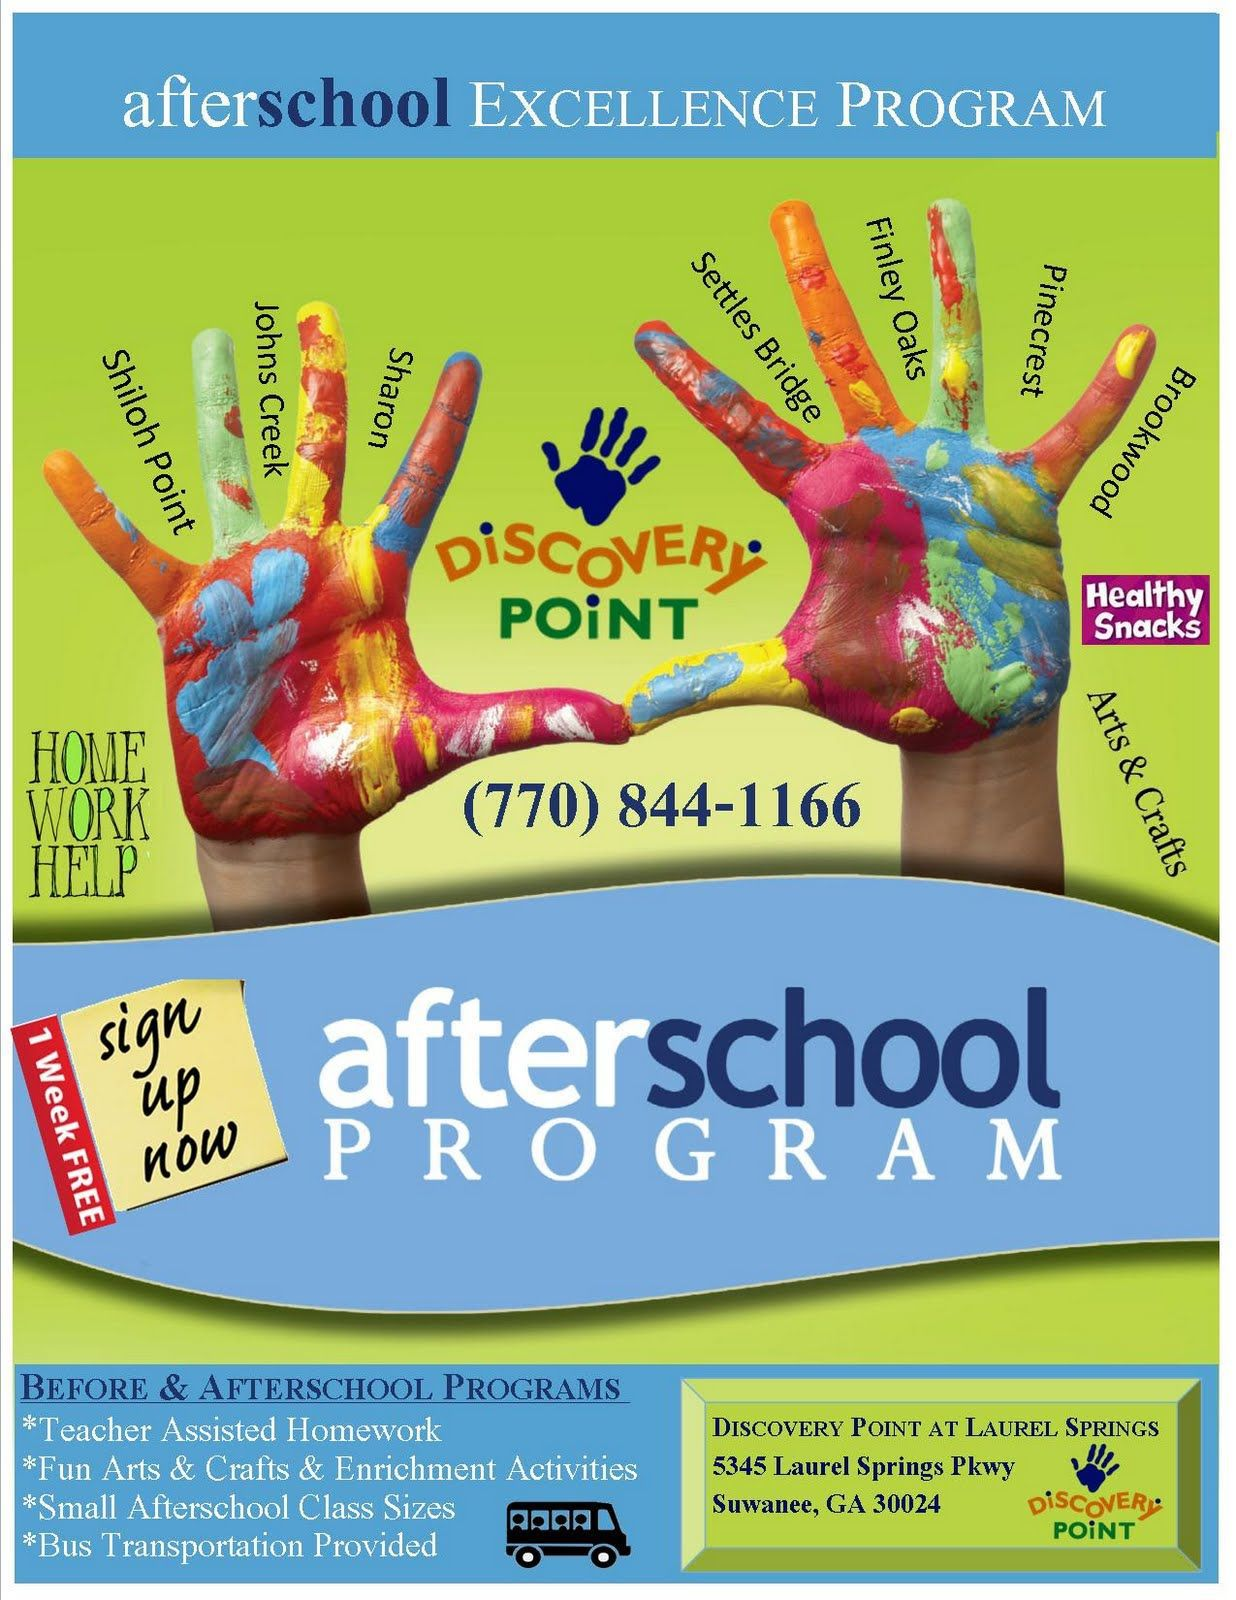 004 Amazing Free After School Program Flyer Template Inspiration Full